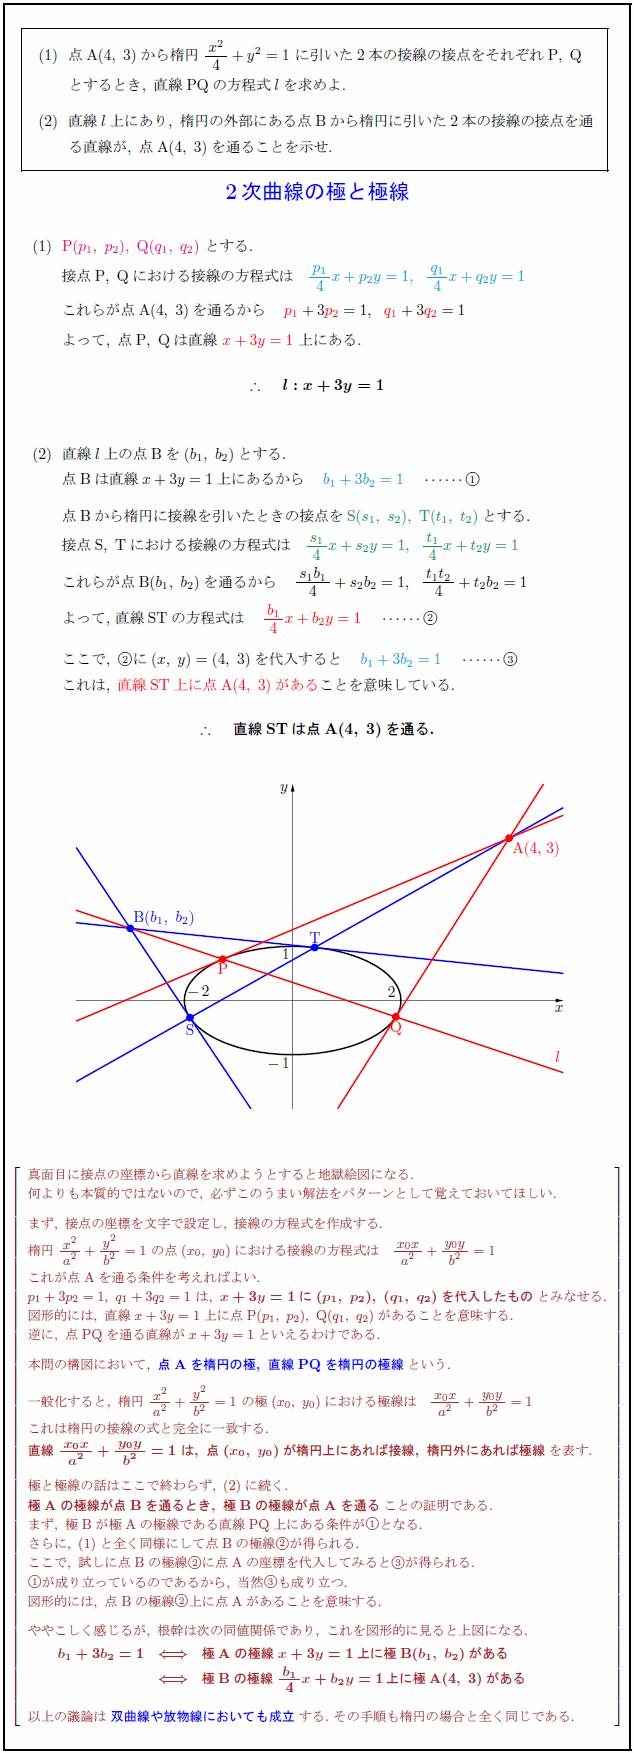 quadratic-curve-polarline